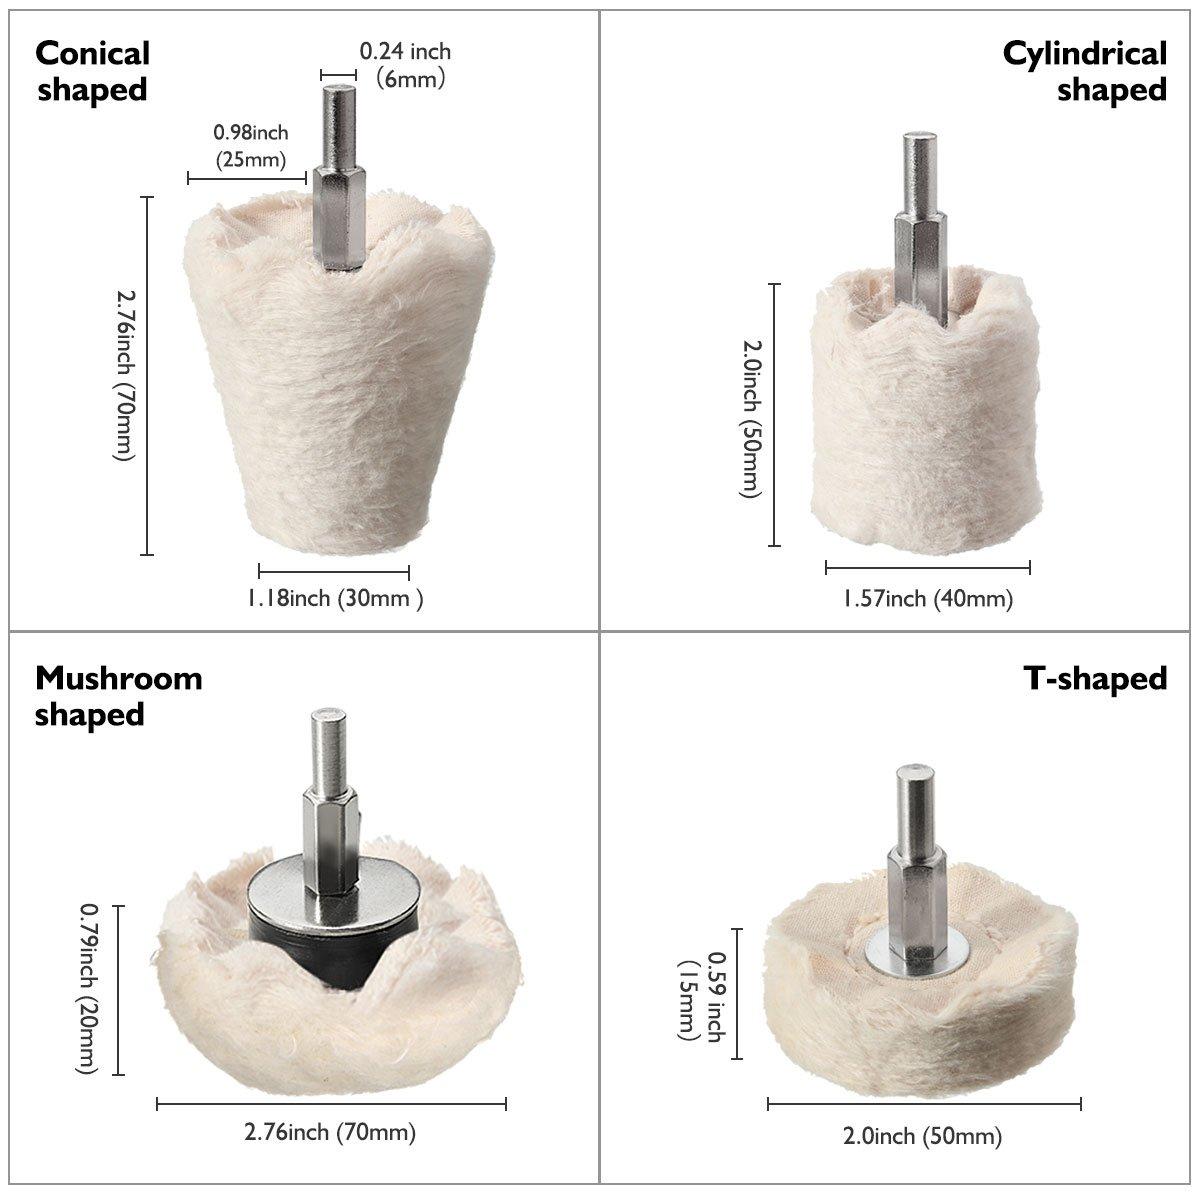 MATCC 4Pcs White Flannelette Polishing Wheel Cone//Column//Mushroom//T-Shaped Wheel Grinding Head with 1//4/'/' Handle for Metal Aluminum,Stainless Steel,Chrome,Jewelry,Wood,Plastic,Ceramic,Glass,etc MATCCYomoid758